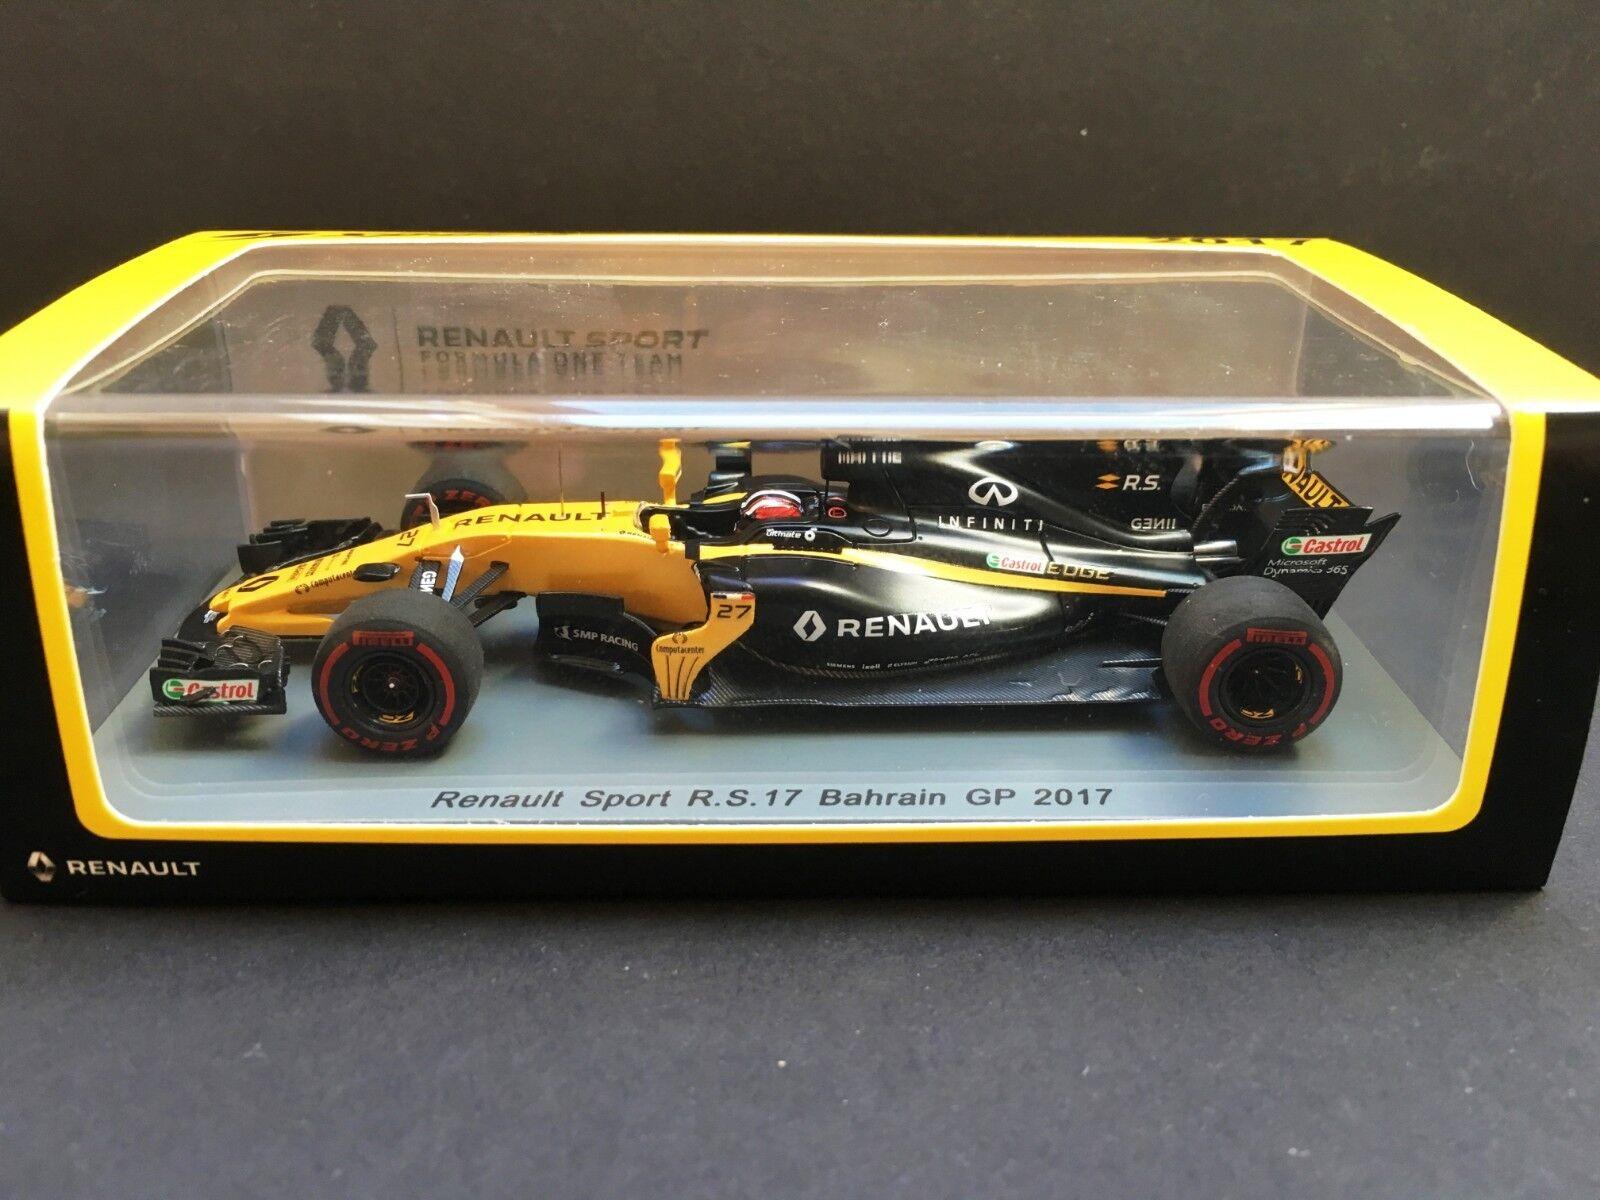 Spark - Nico Hulkenberg - Renault - R.S.17 - 2017 - 1 43 - Bahrain GP - Rare